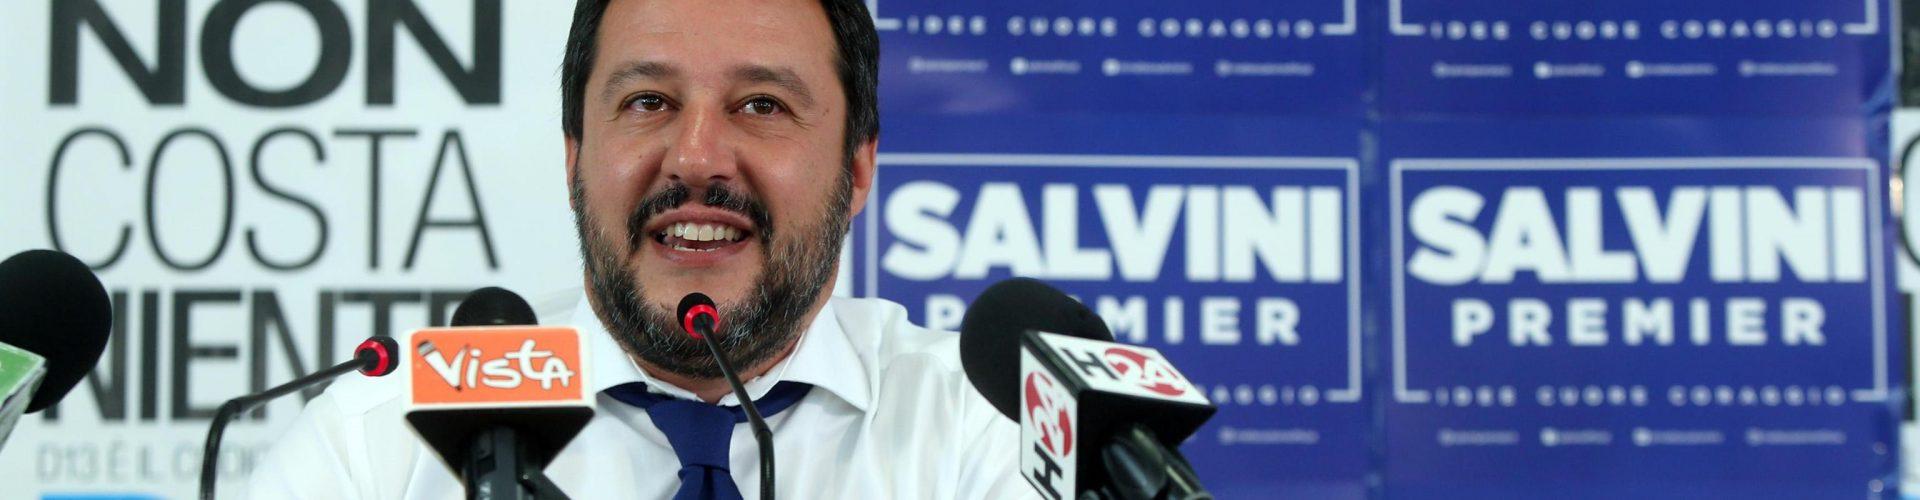 Salvini vara la Lega 2.0. Niente più Padania ma Italia federale